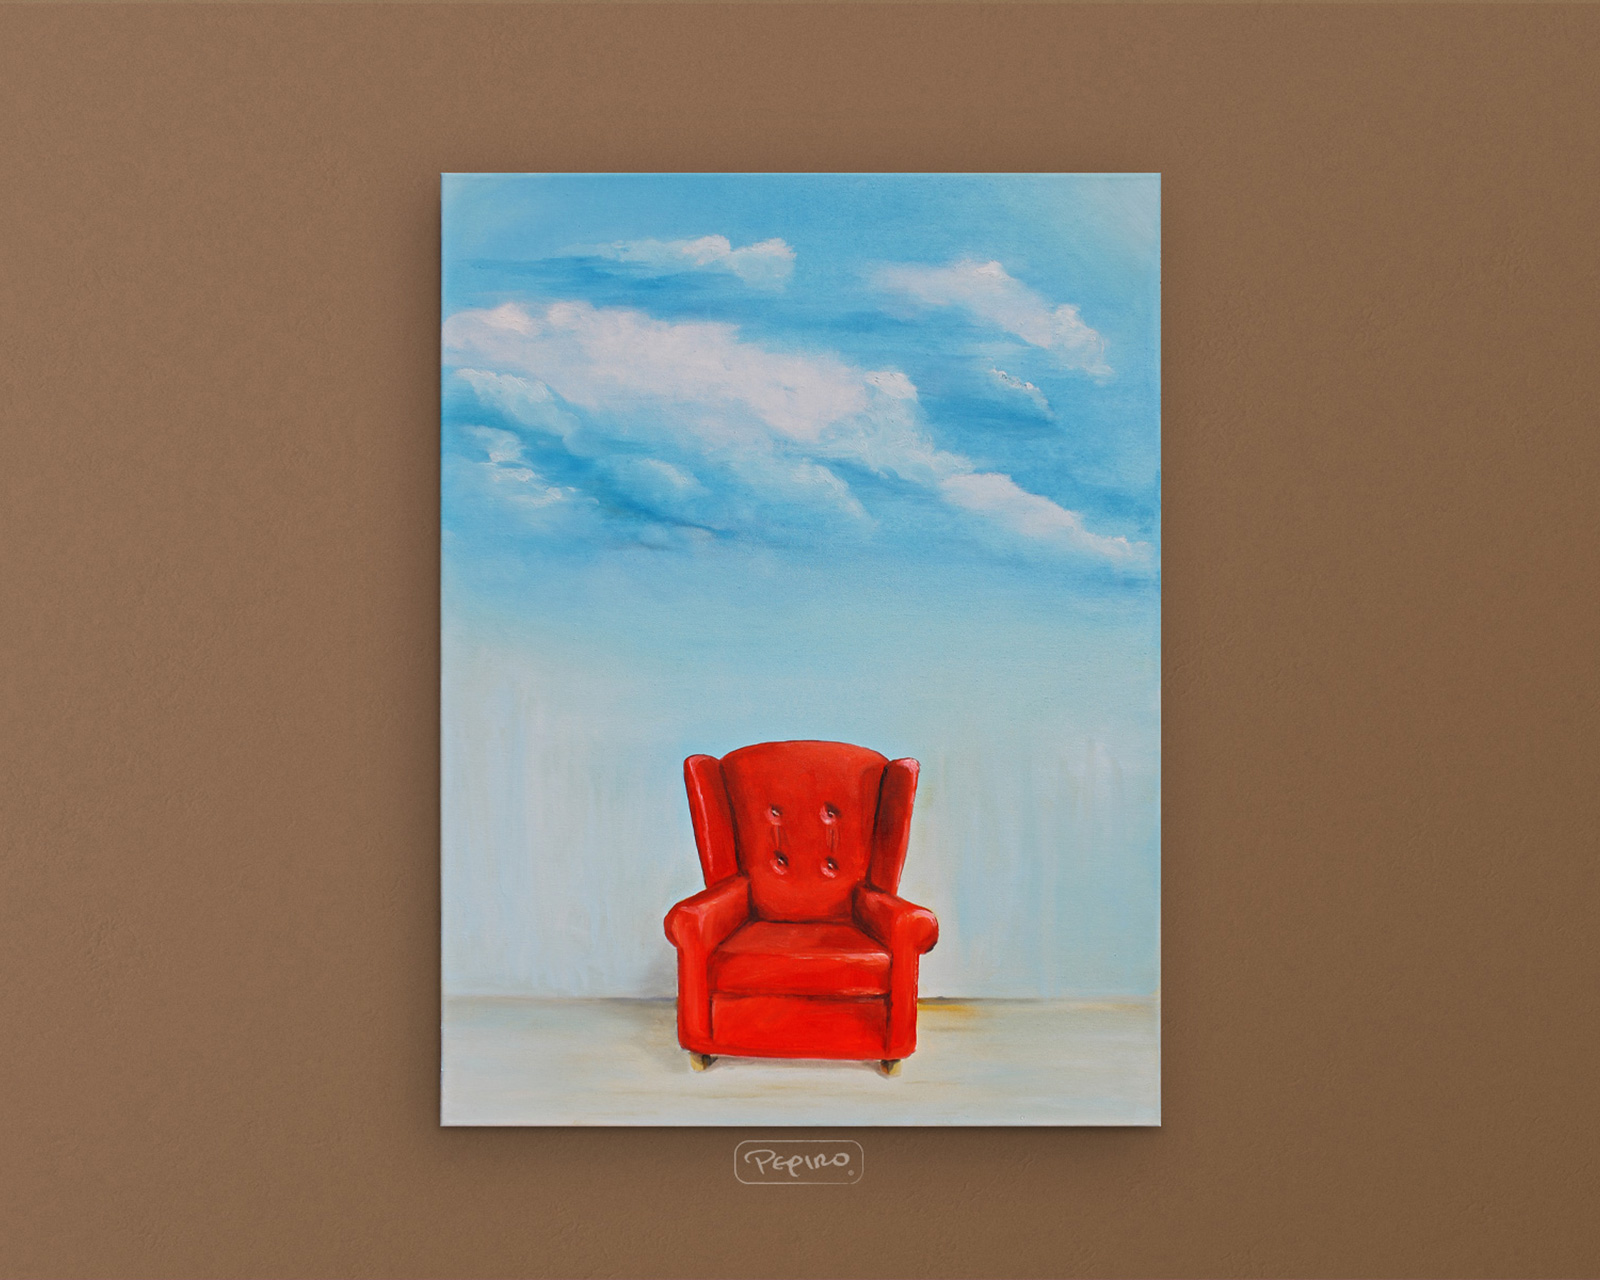 pepiro_van_roncha oil paint 'Red Armchair'